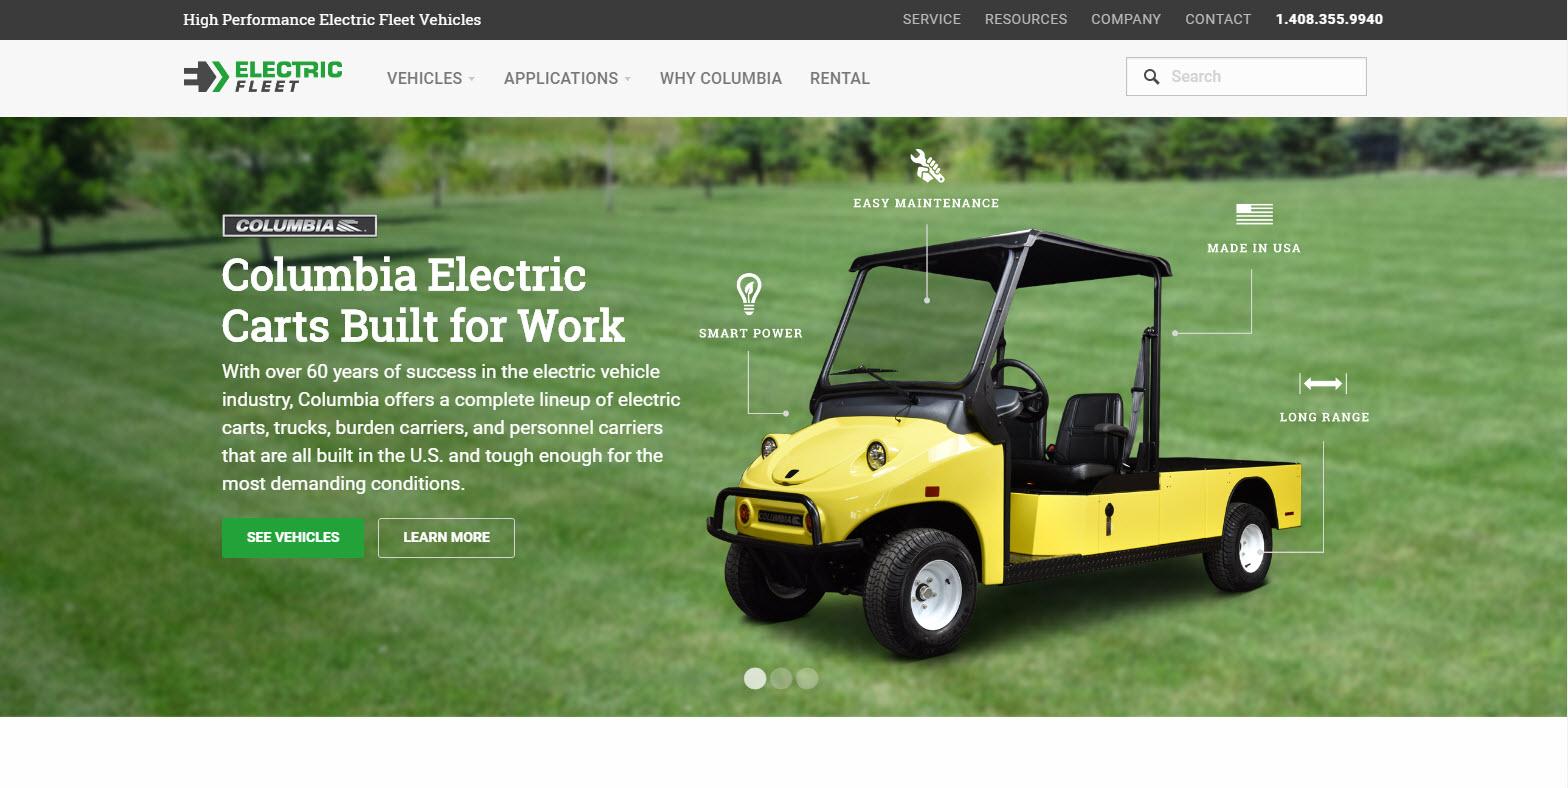 electricfleet.com